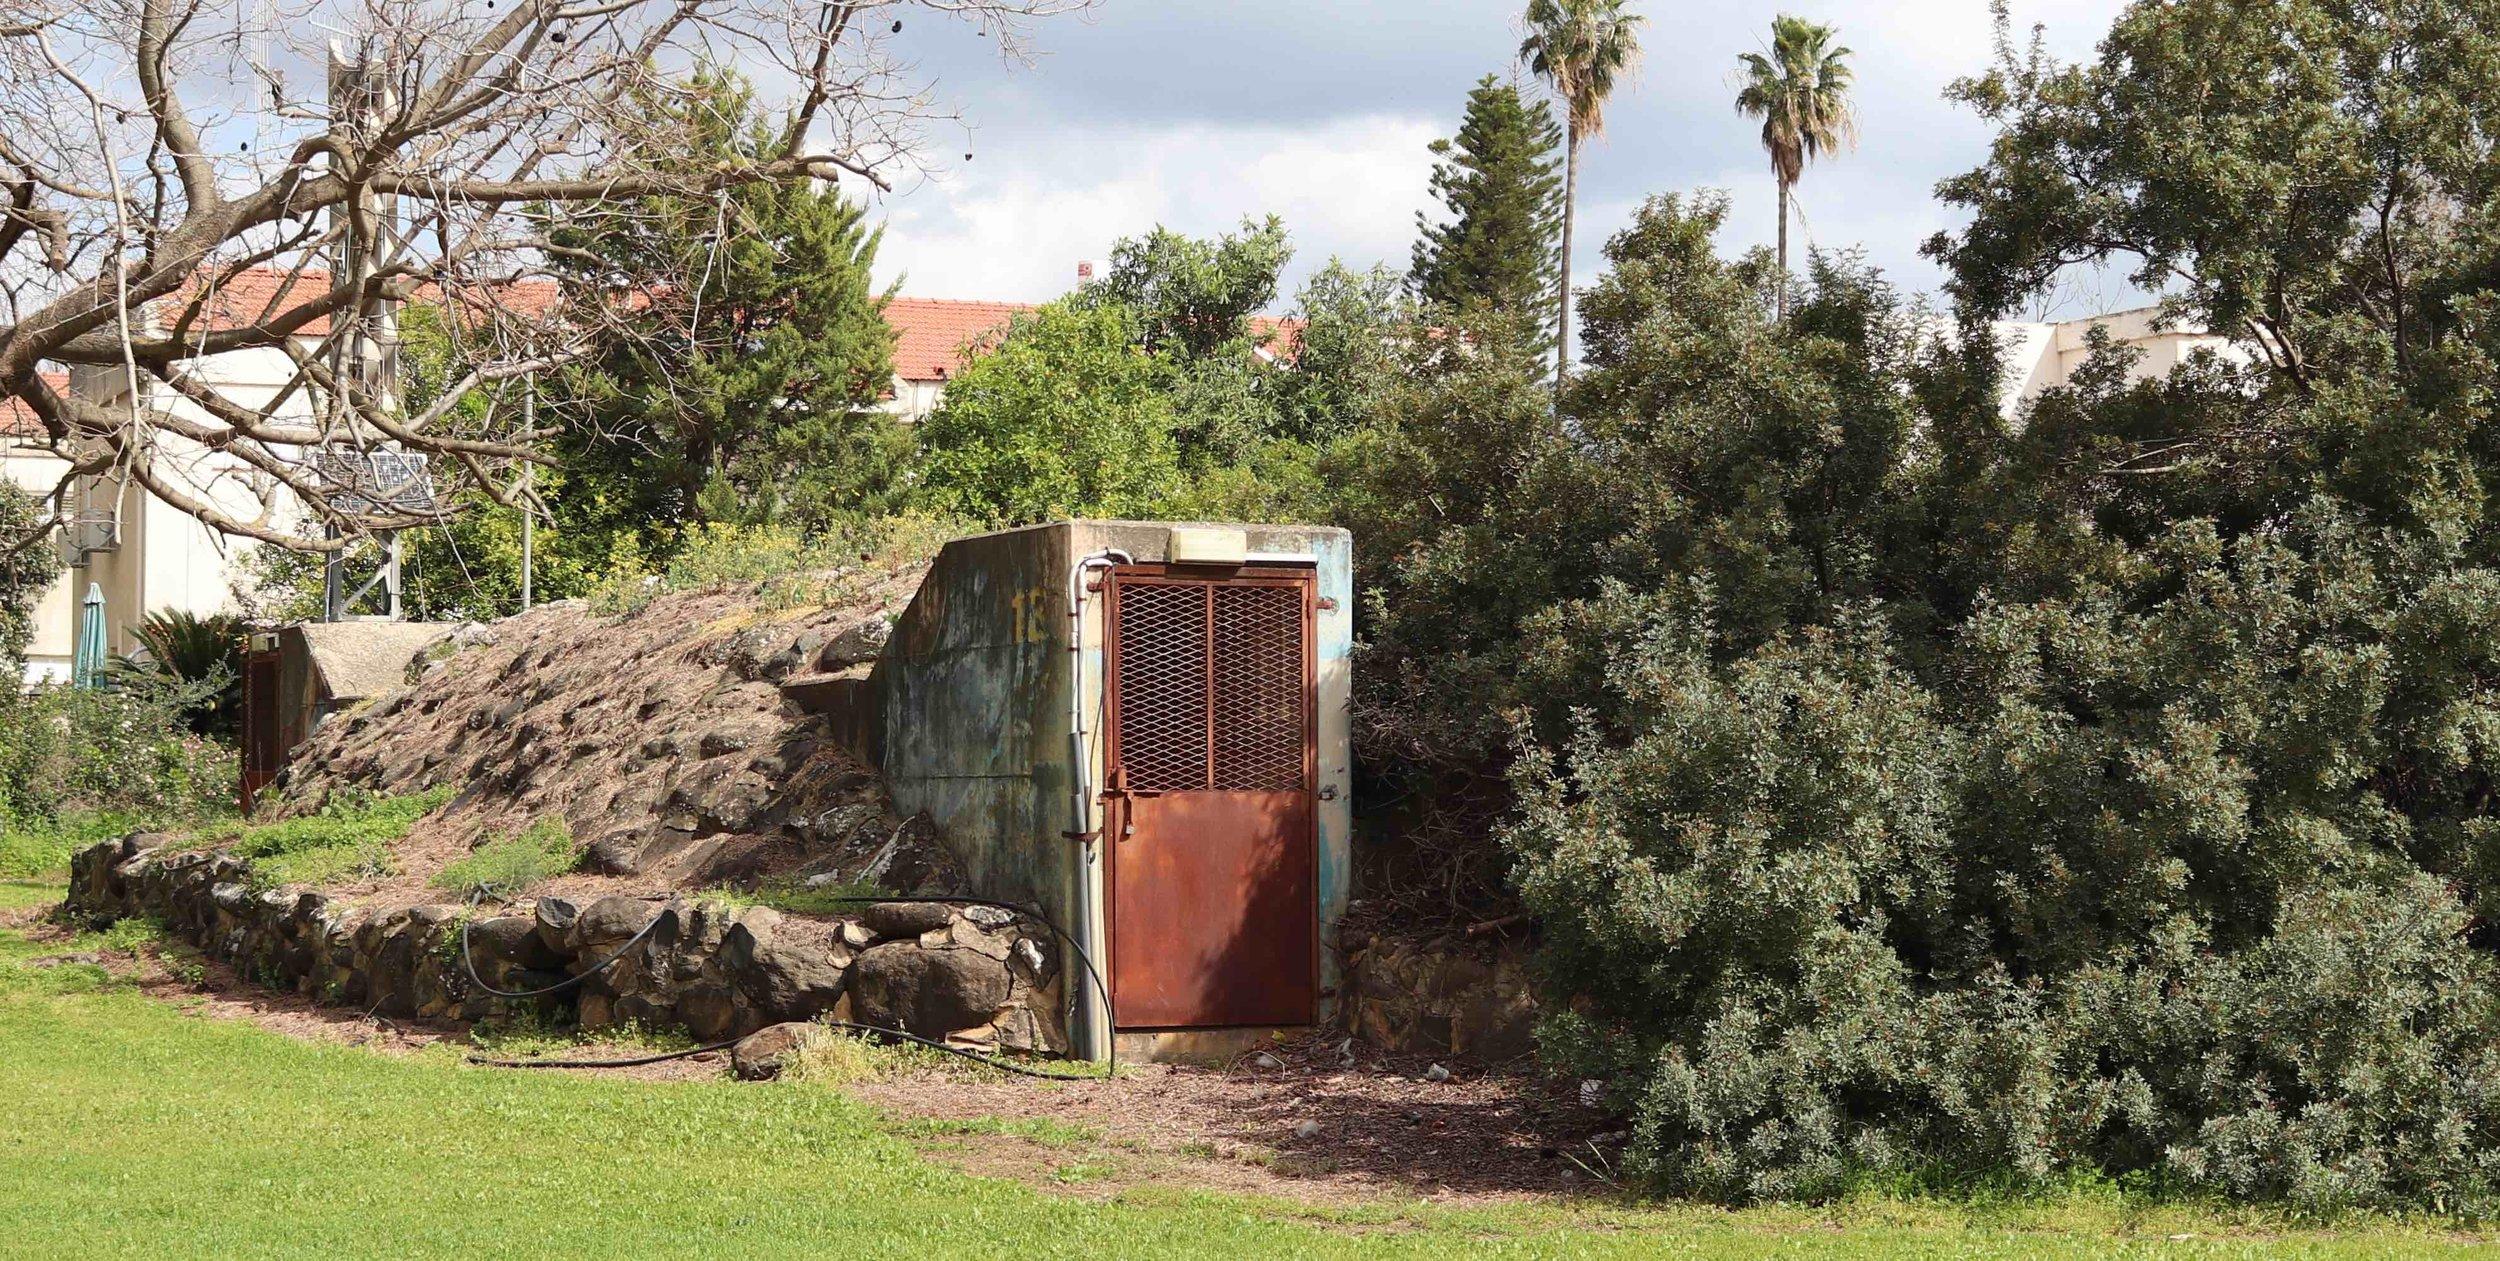 Bomb shelter doorway at Kibbutz Dafna.